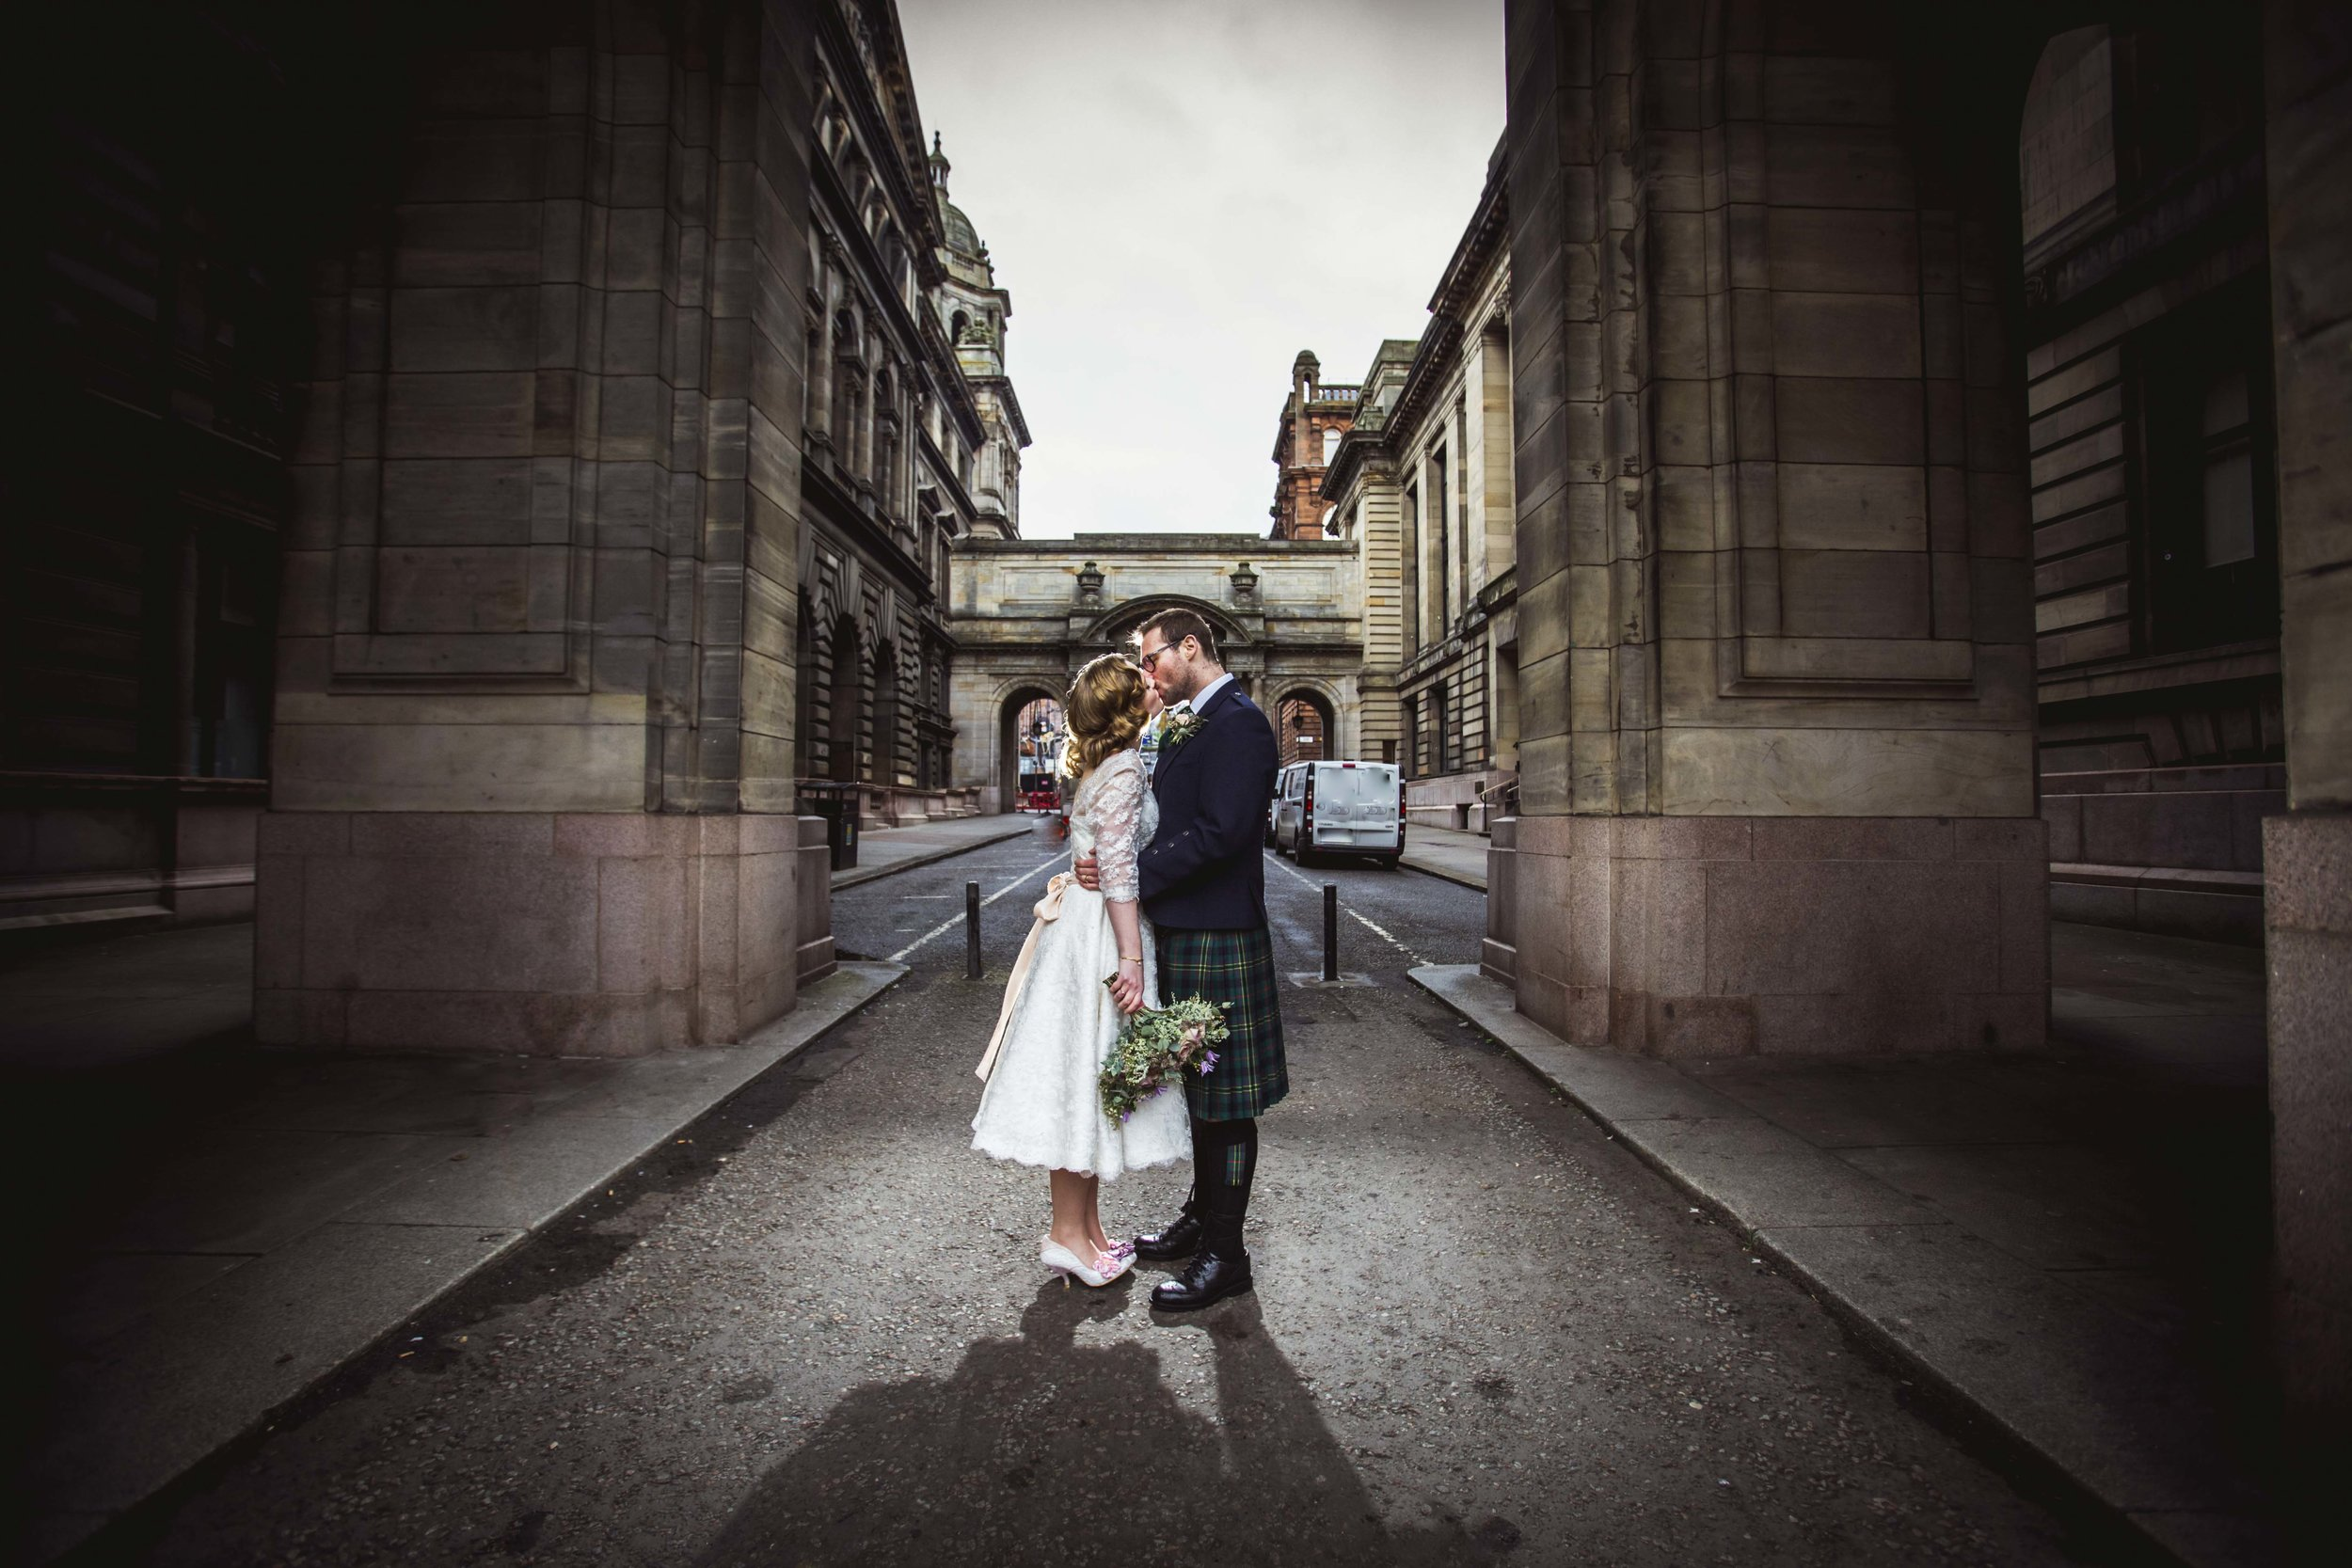 Sophie & Graeme Wedding Nov 2018  152  web.JPG